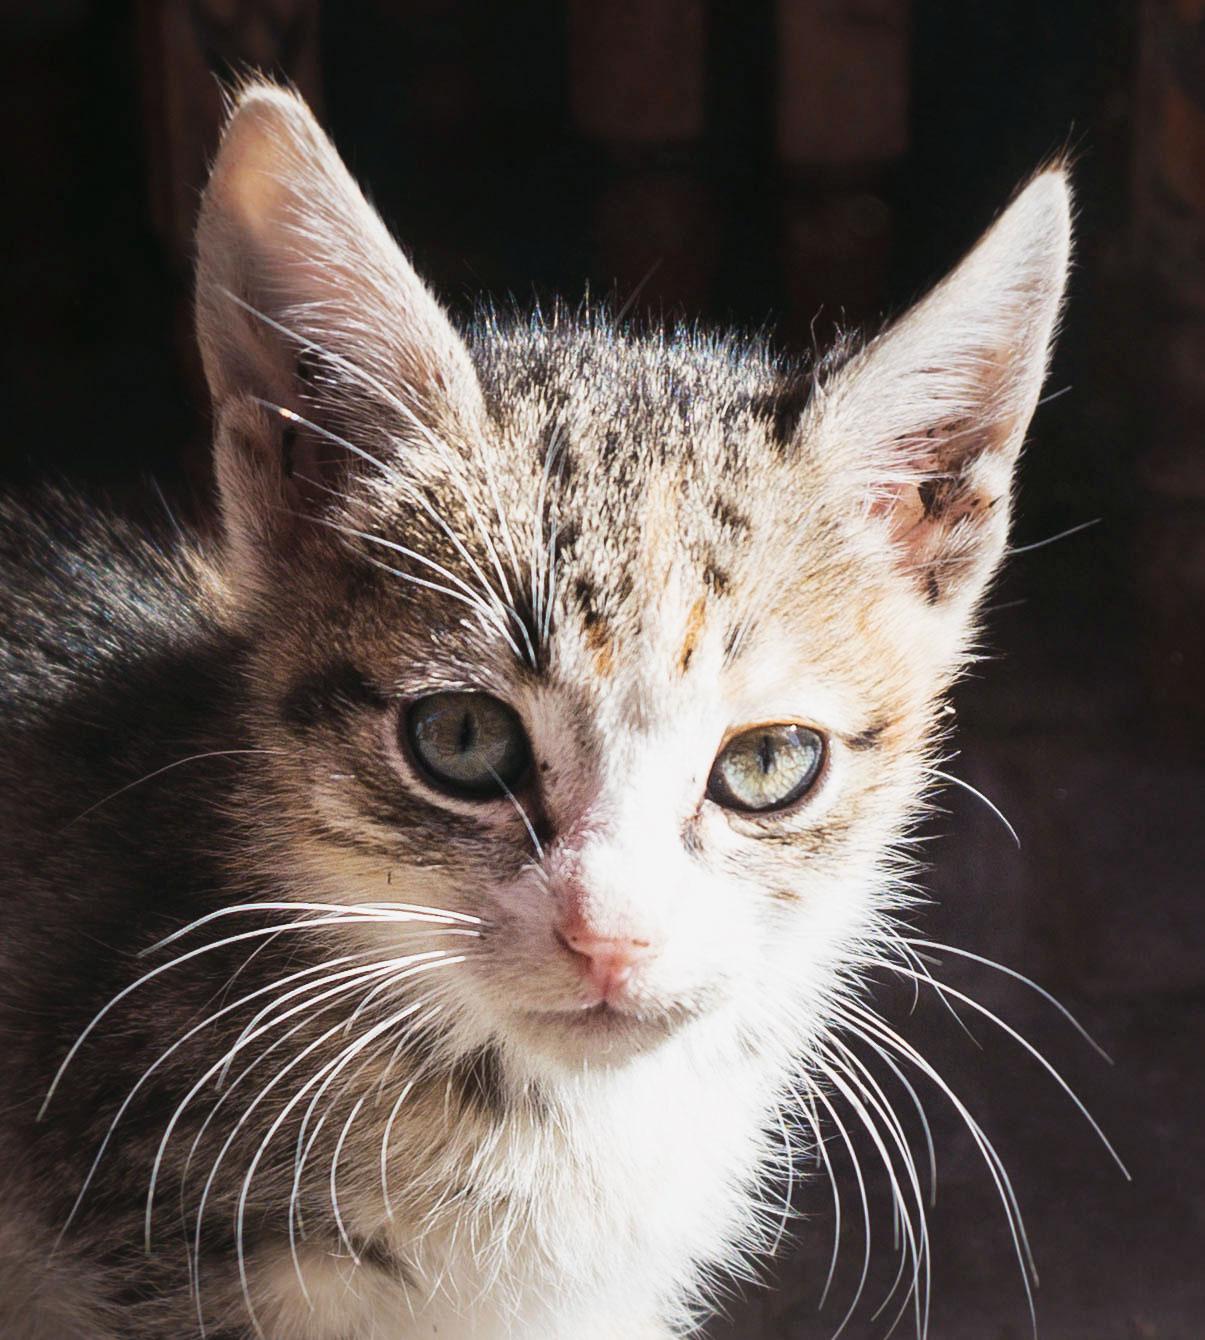 The street cats of Marrakech